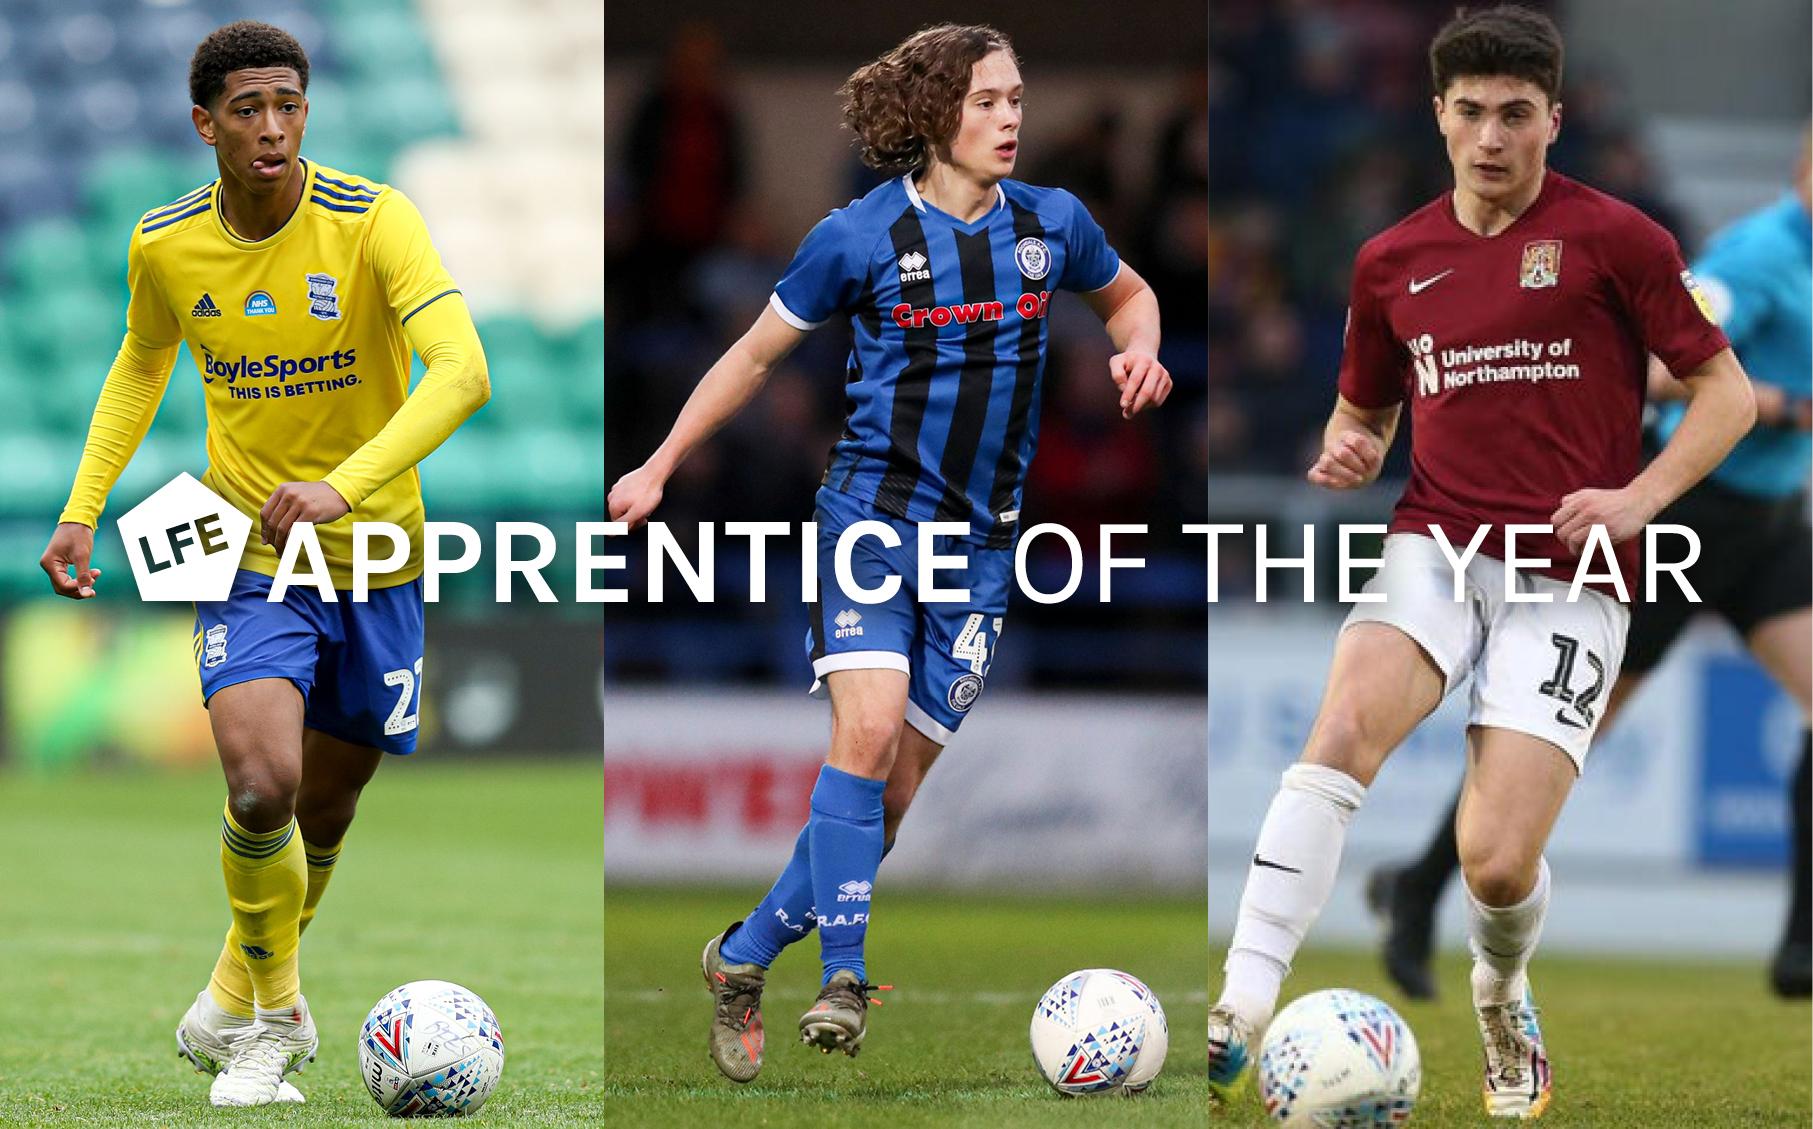 LFE Apprentice of the Year 2020 winners